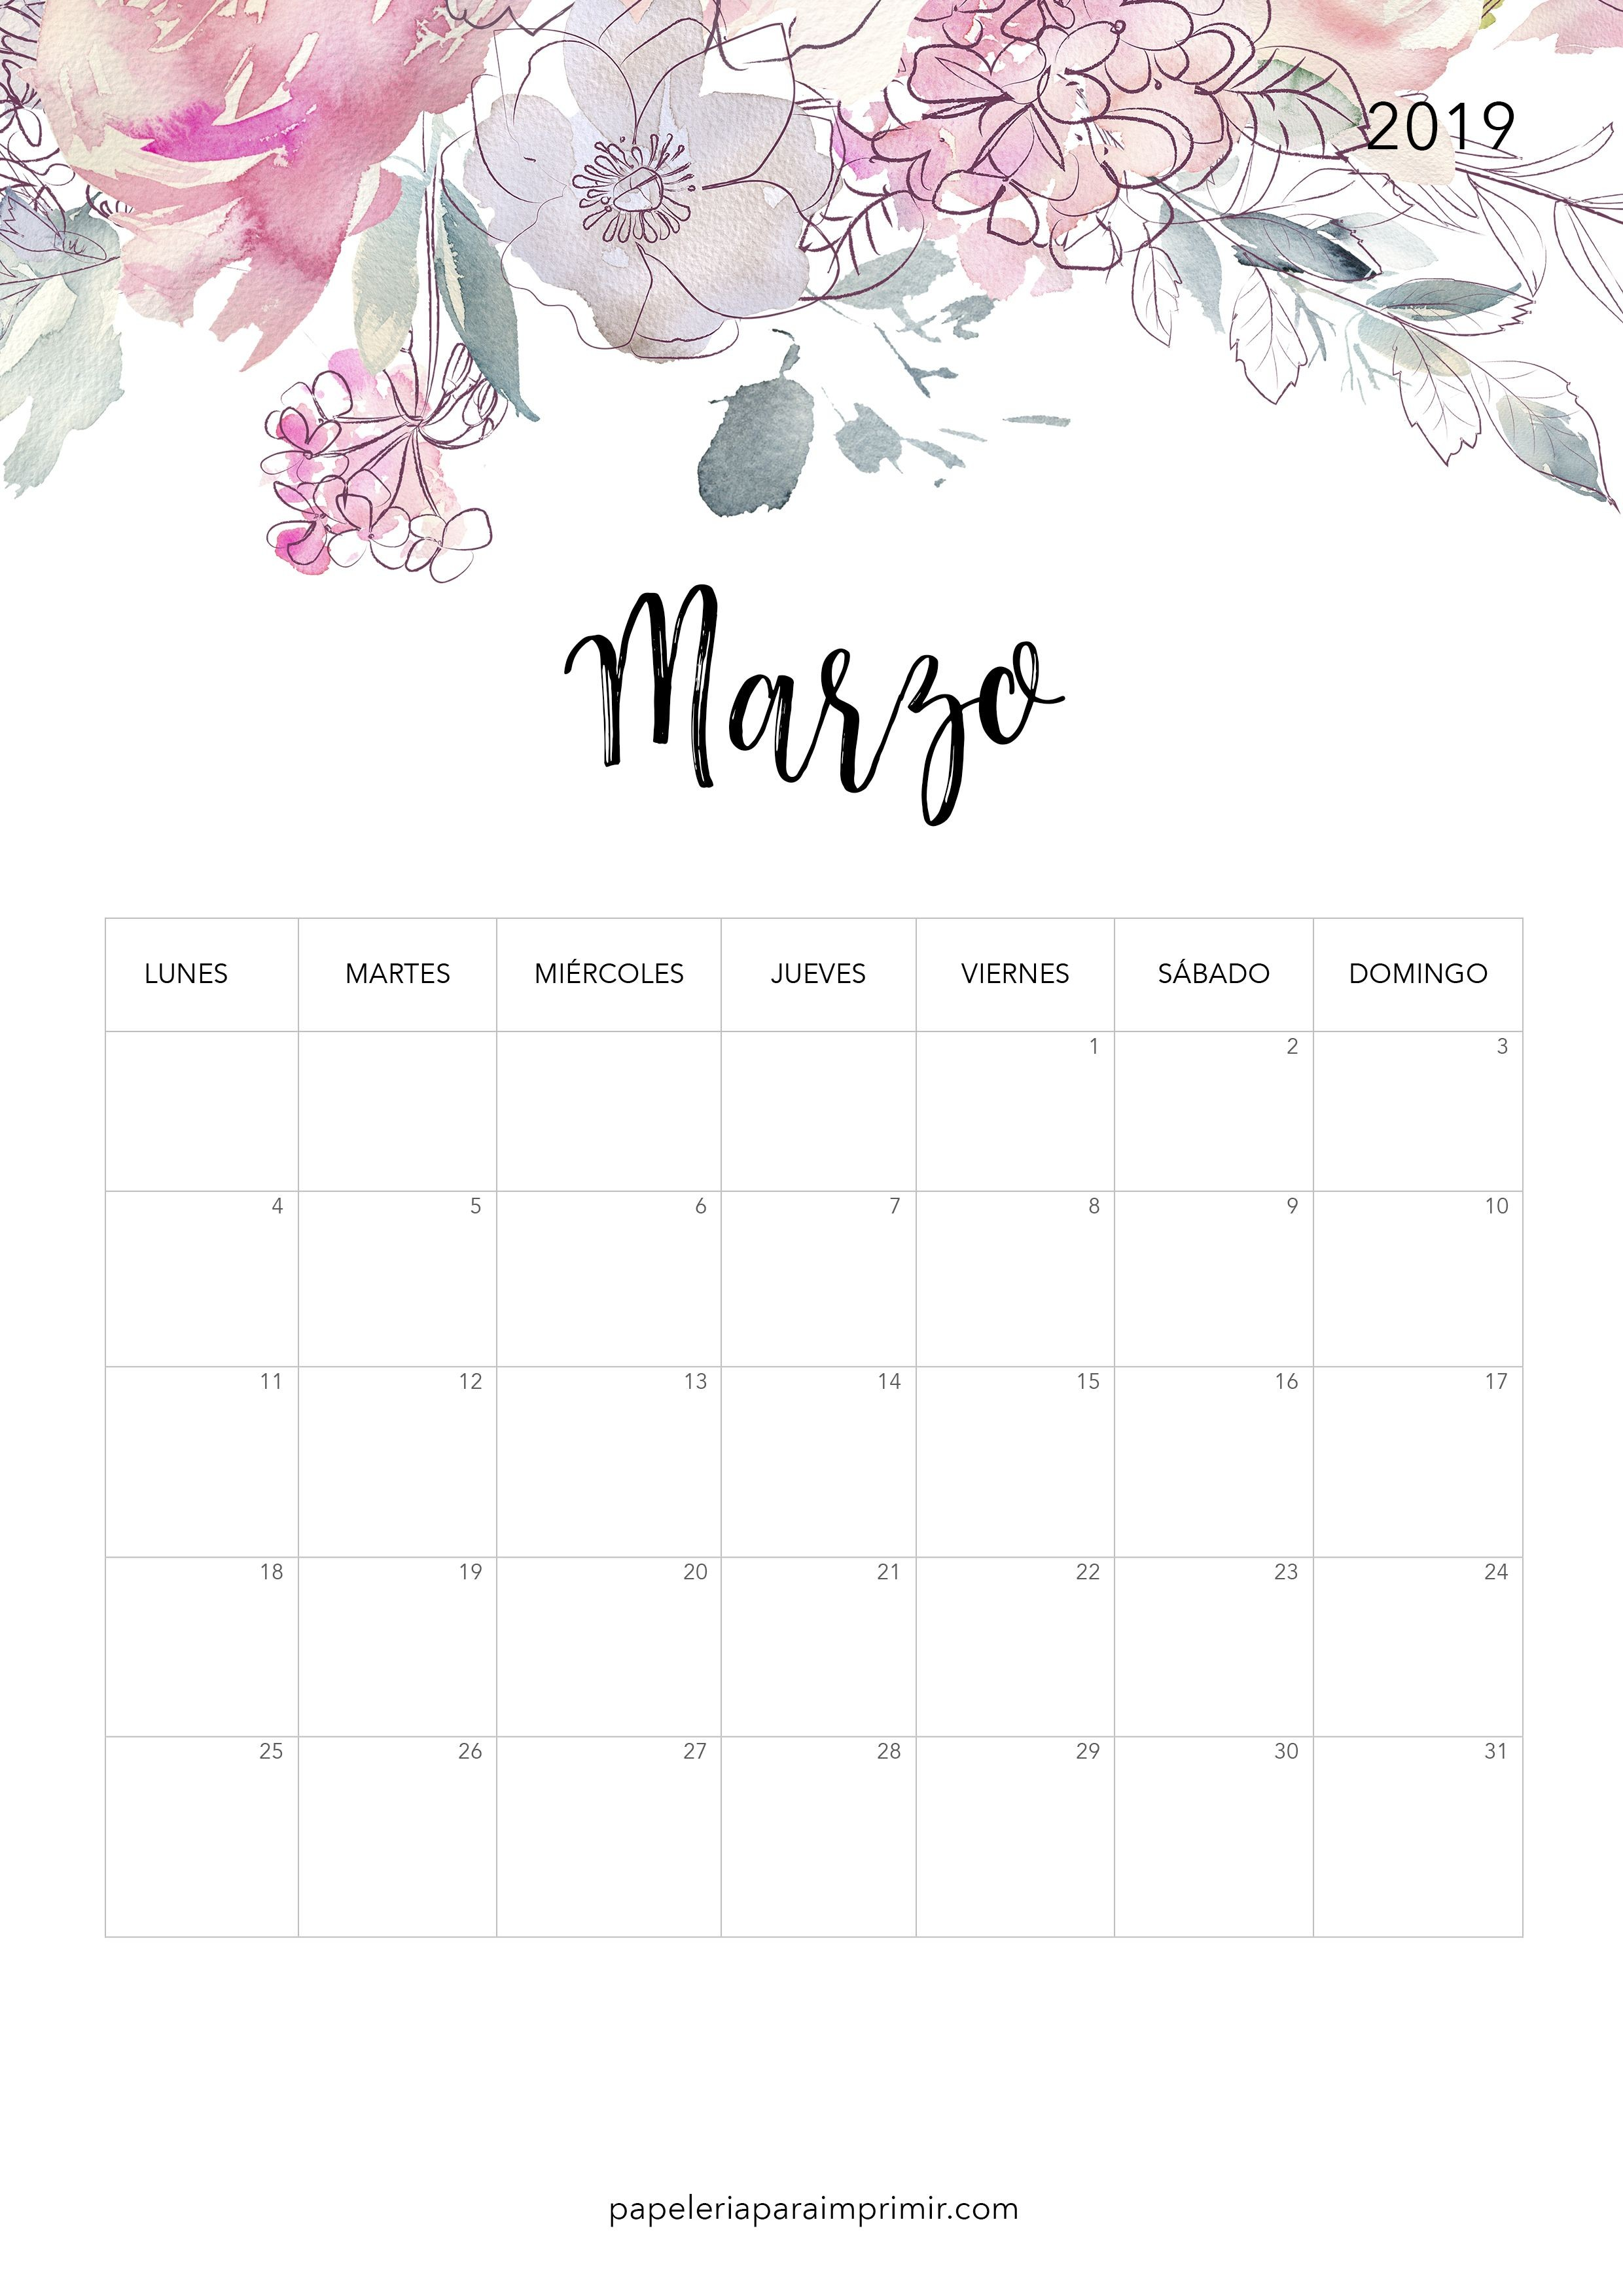 Calendario para imprimir Marzo 2019 calendario imprimir marzo march printable freebie gratis papeleria stationary flores flowers nature